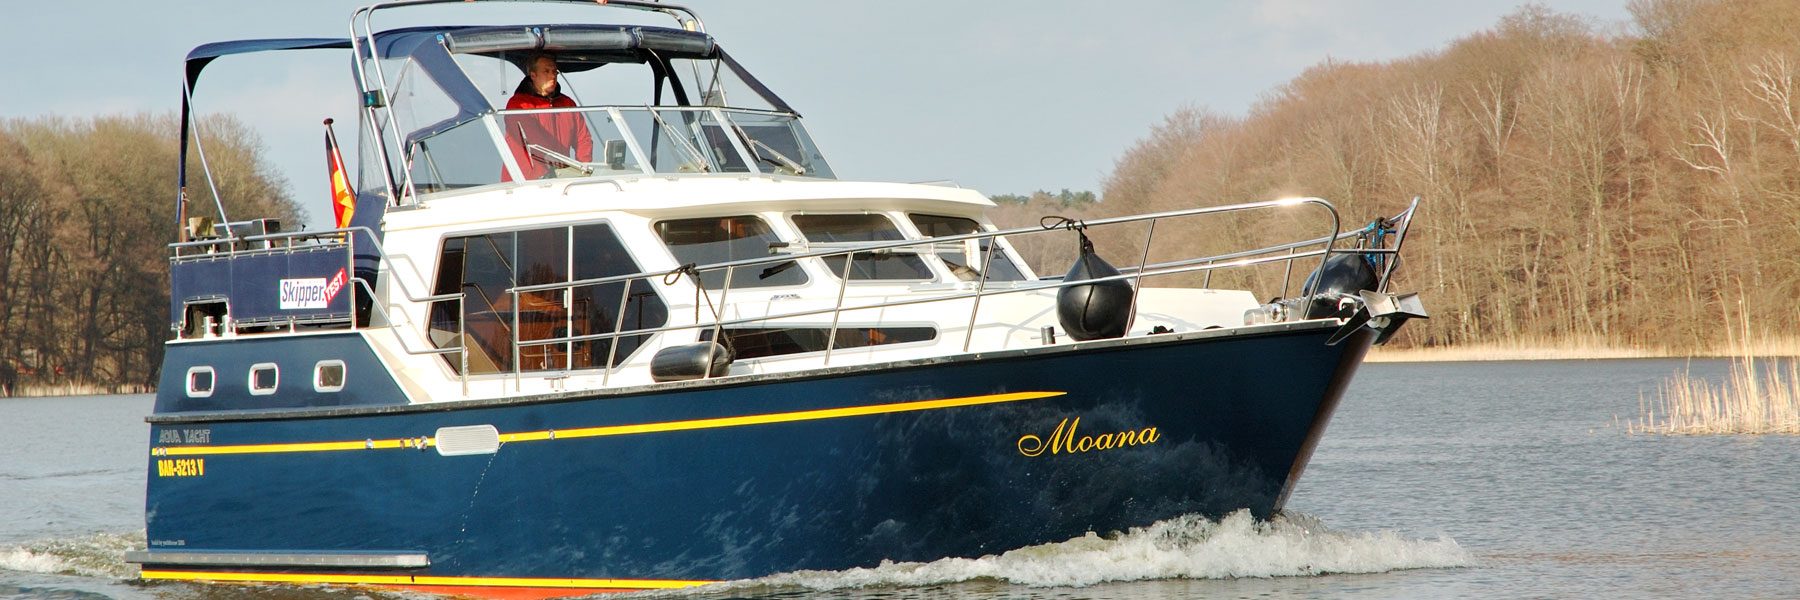 Yacht Moana - Yachthafen Priepert